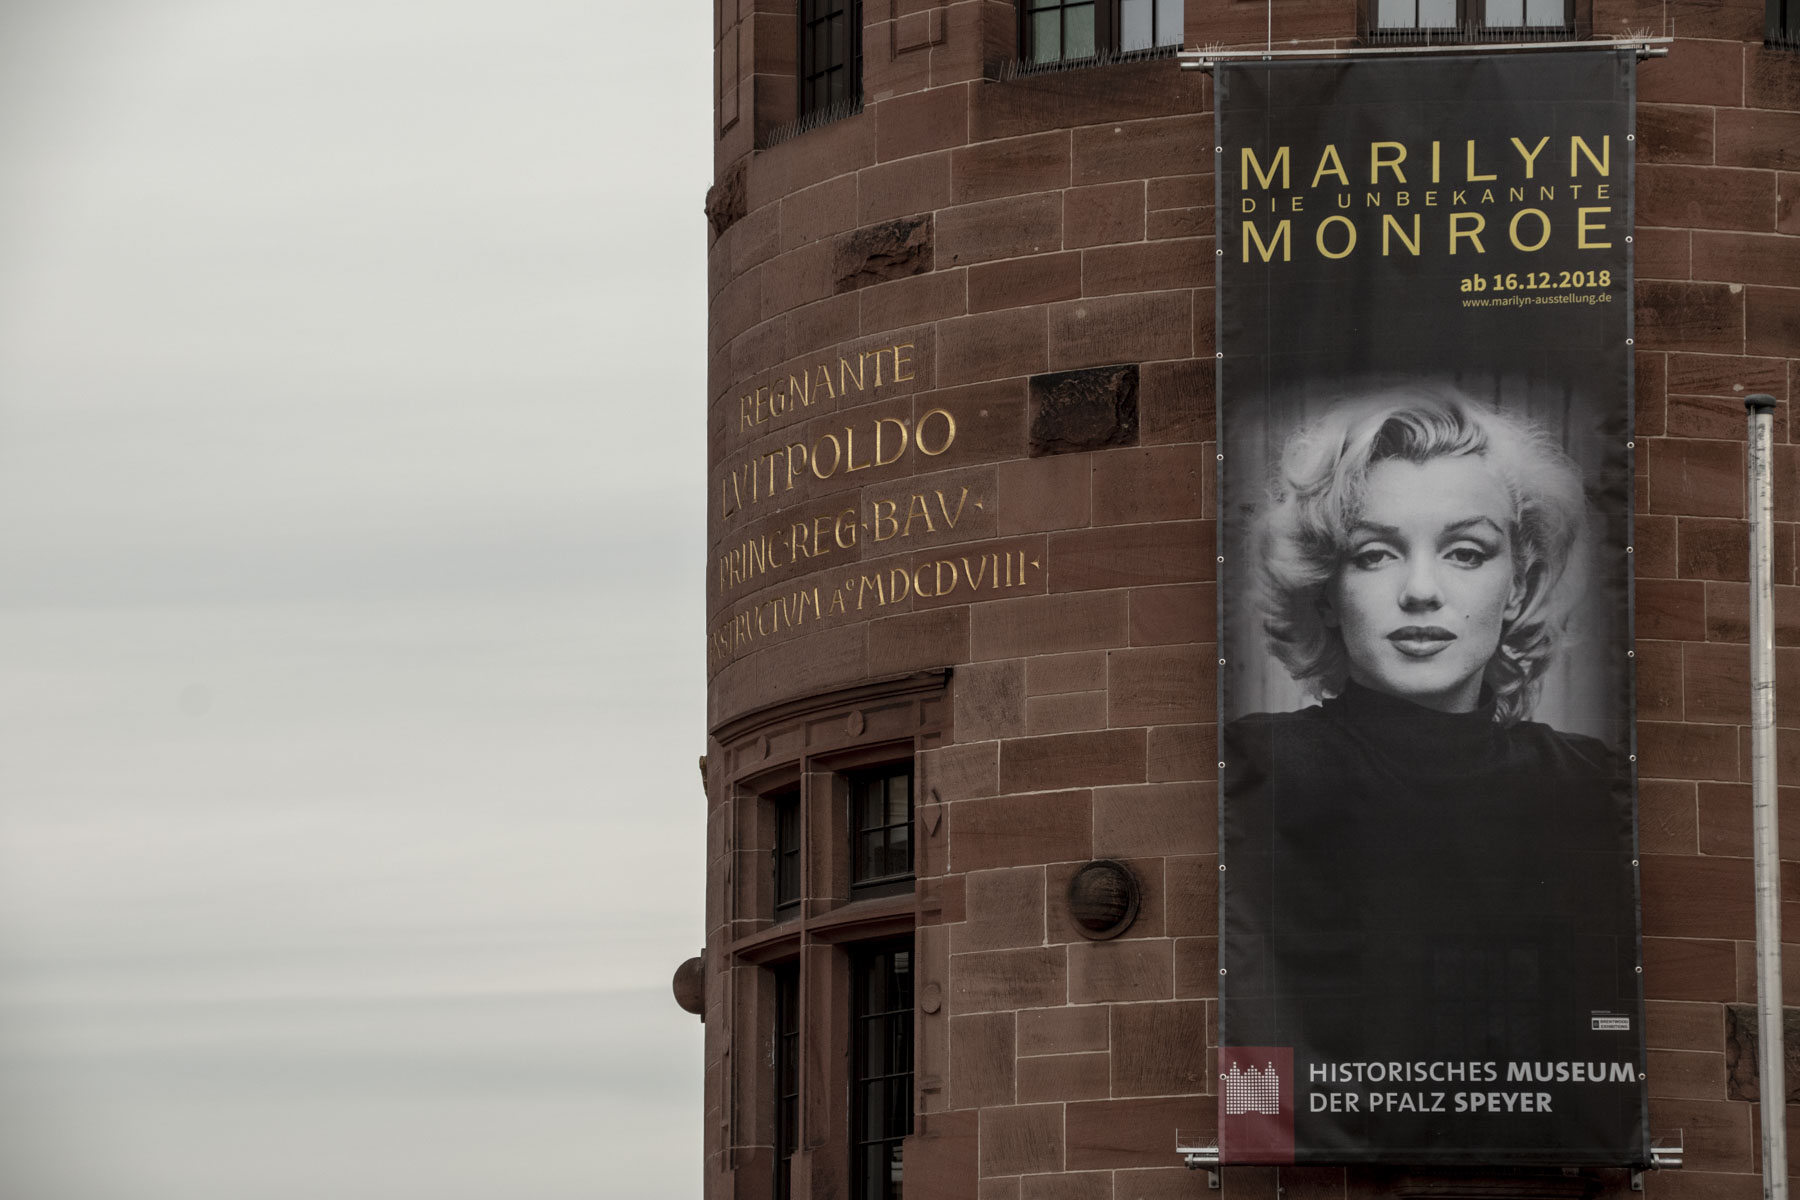 Marilyn Monroe Ausstellung Speyer